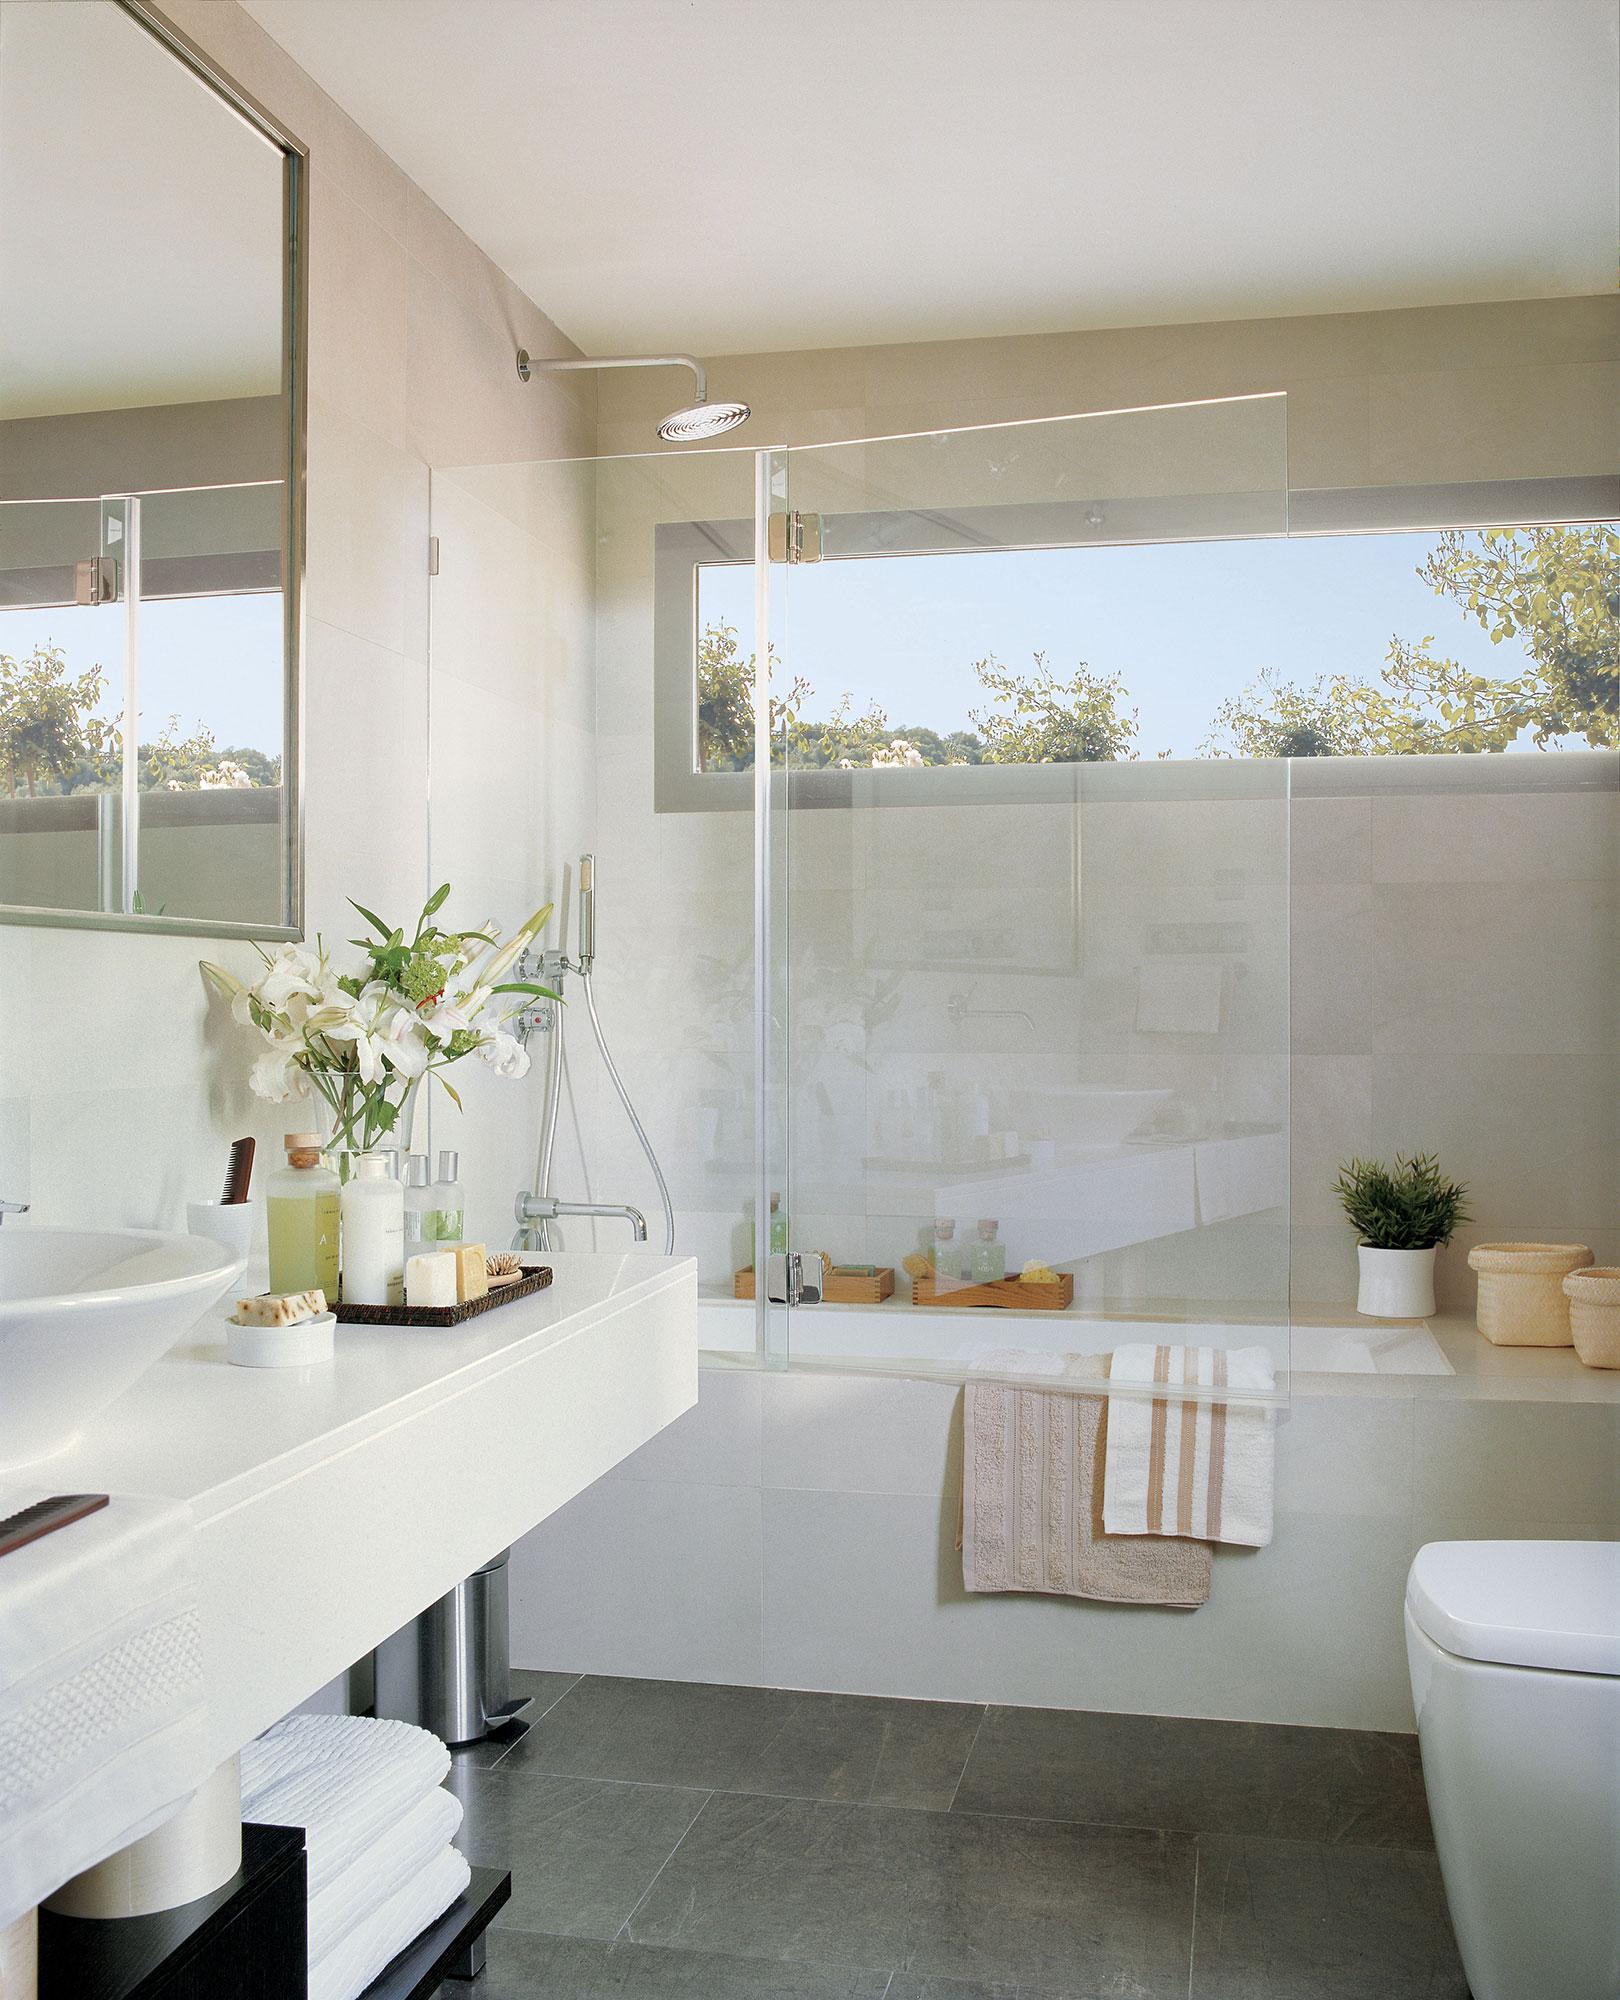 Trucos naturales para mantener el ba o impecable for Articulos para bano hogar